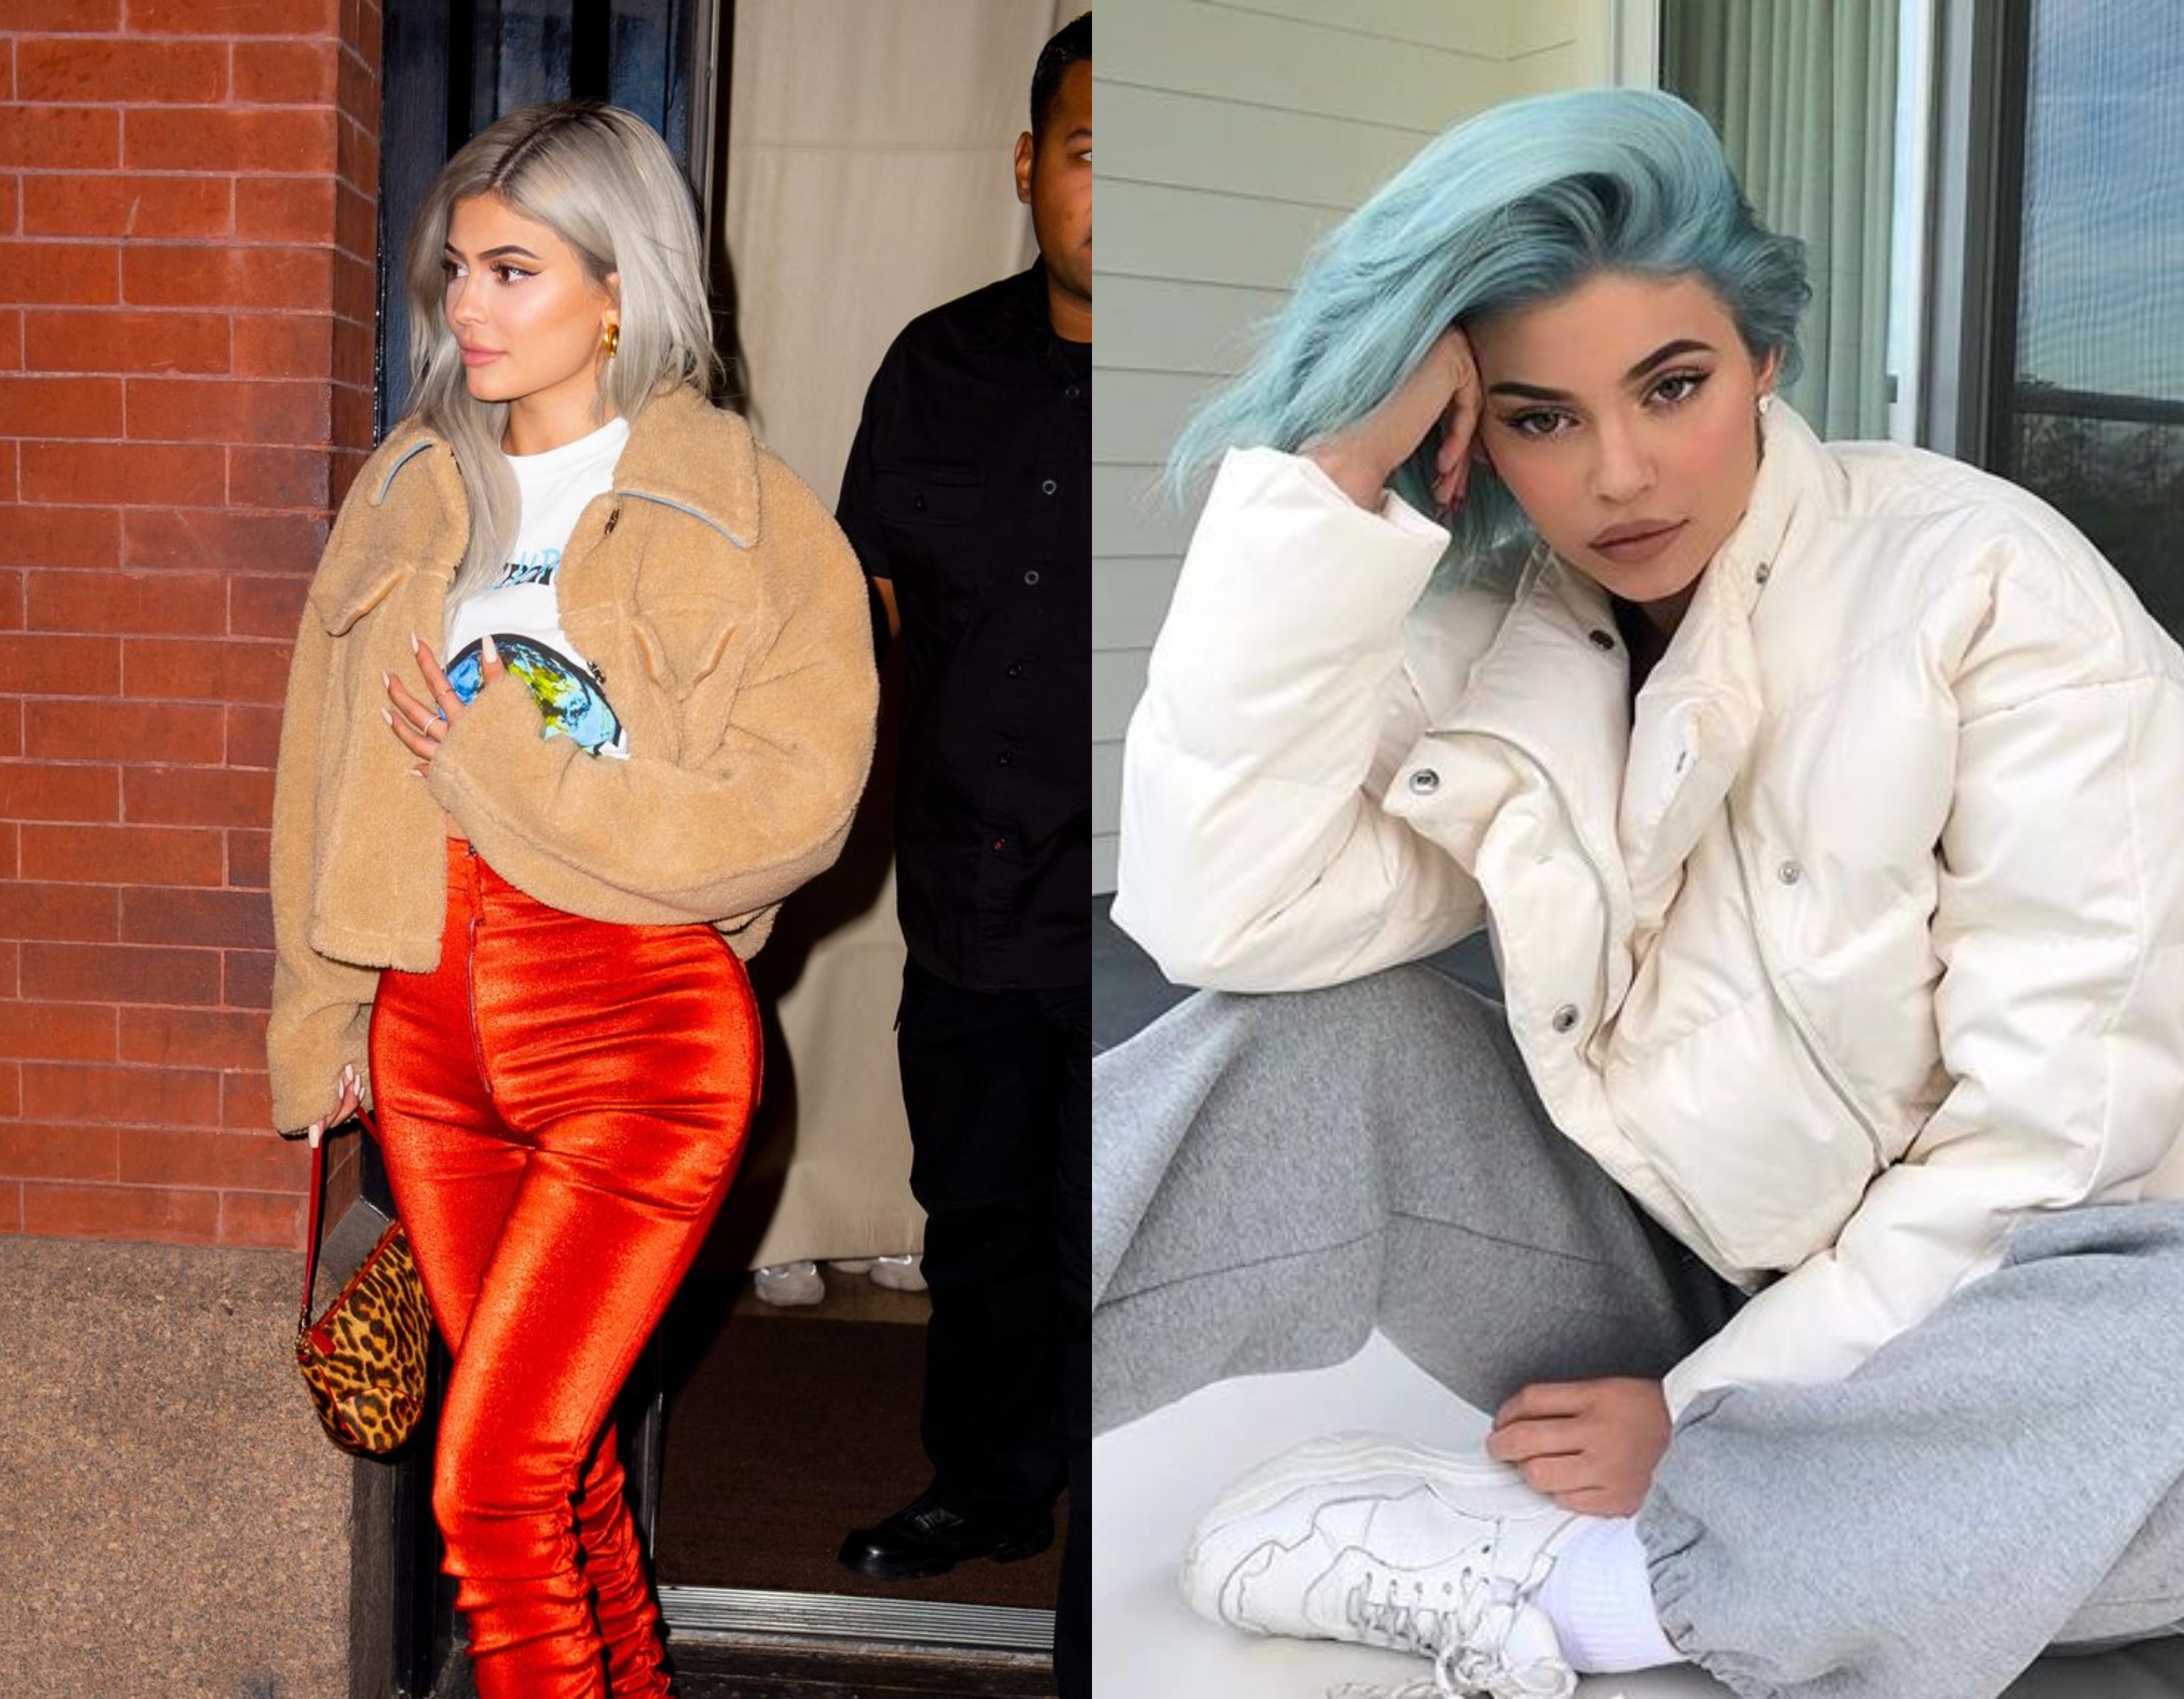 De Kylie Jenner is electric blue hangulatban volt egy ideig